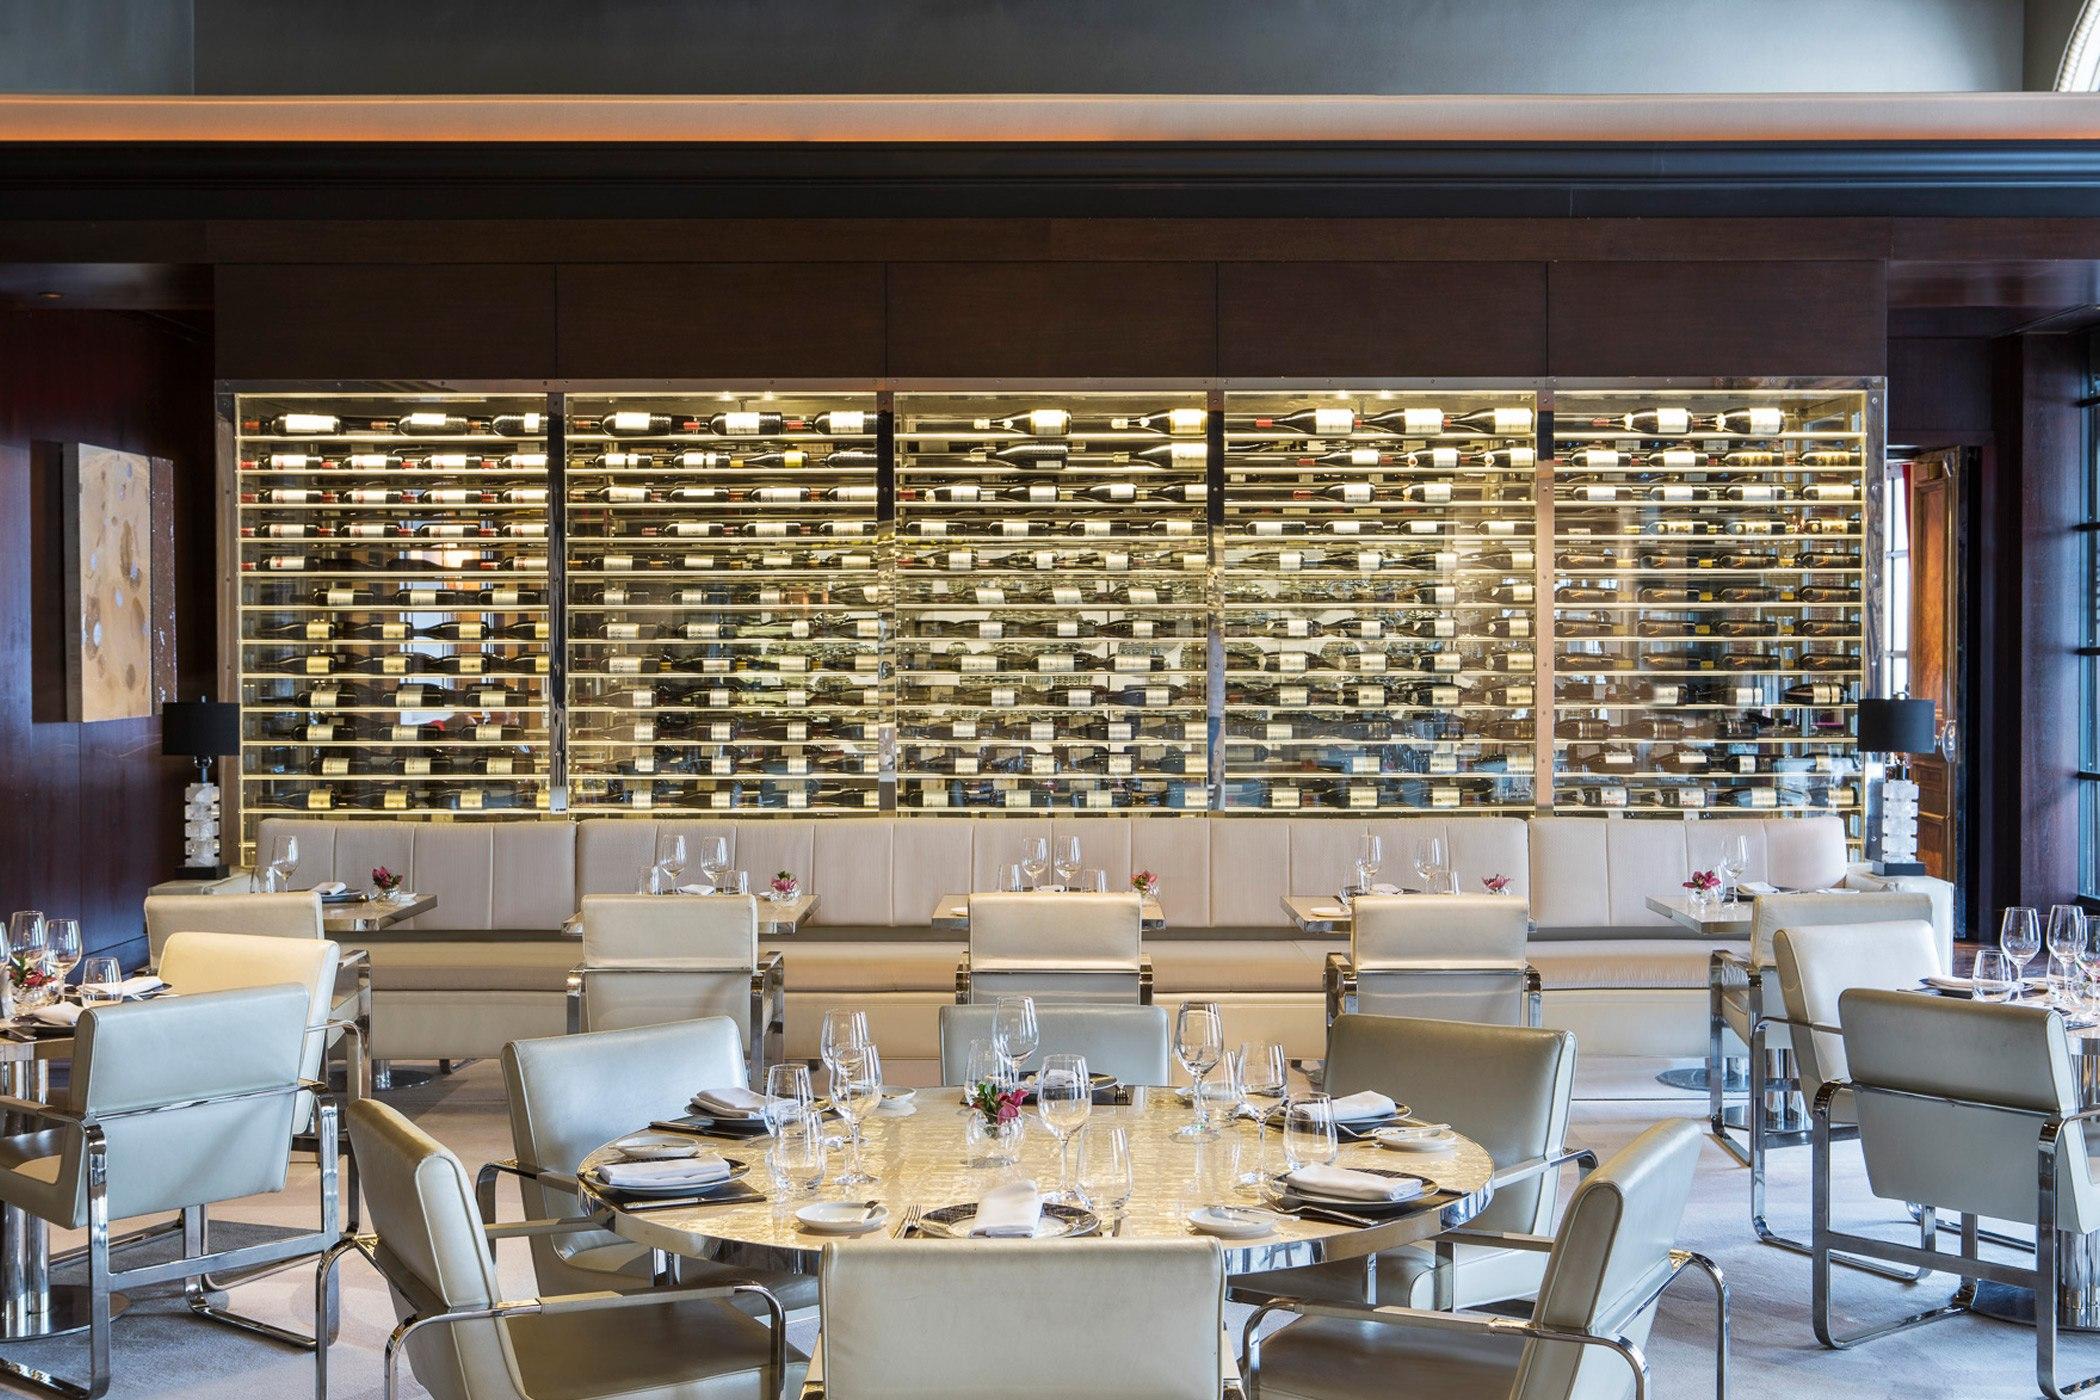 st-regis-dc-restaurant-alhambra-interior-02